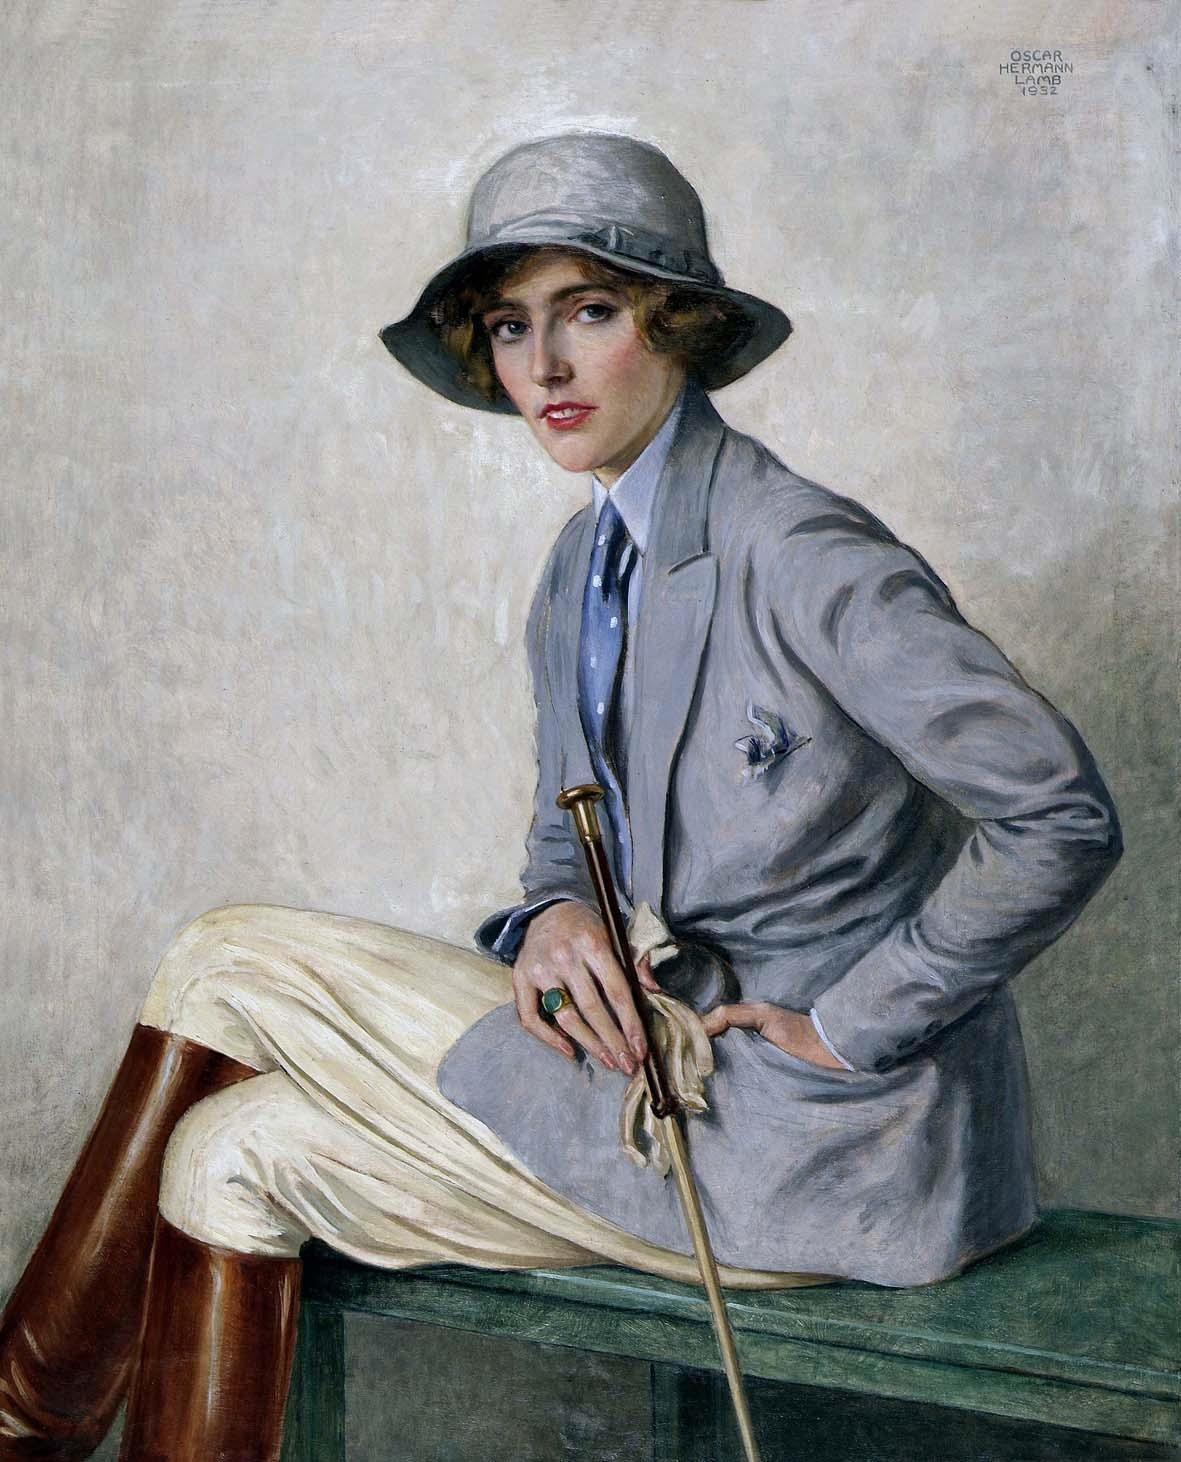 Mostra Trieste - Amazzone dipinta da Oscar Lamb, olio su tela